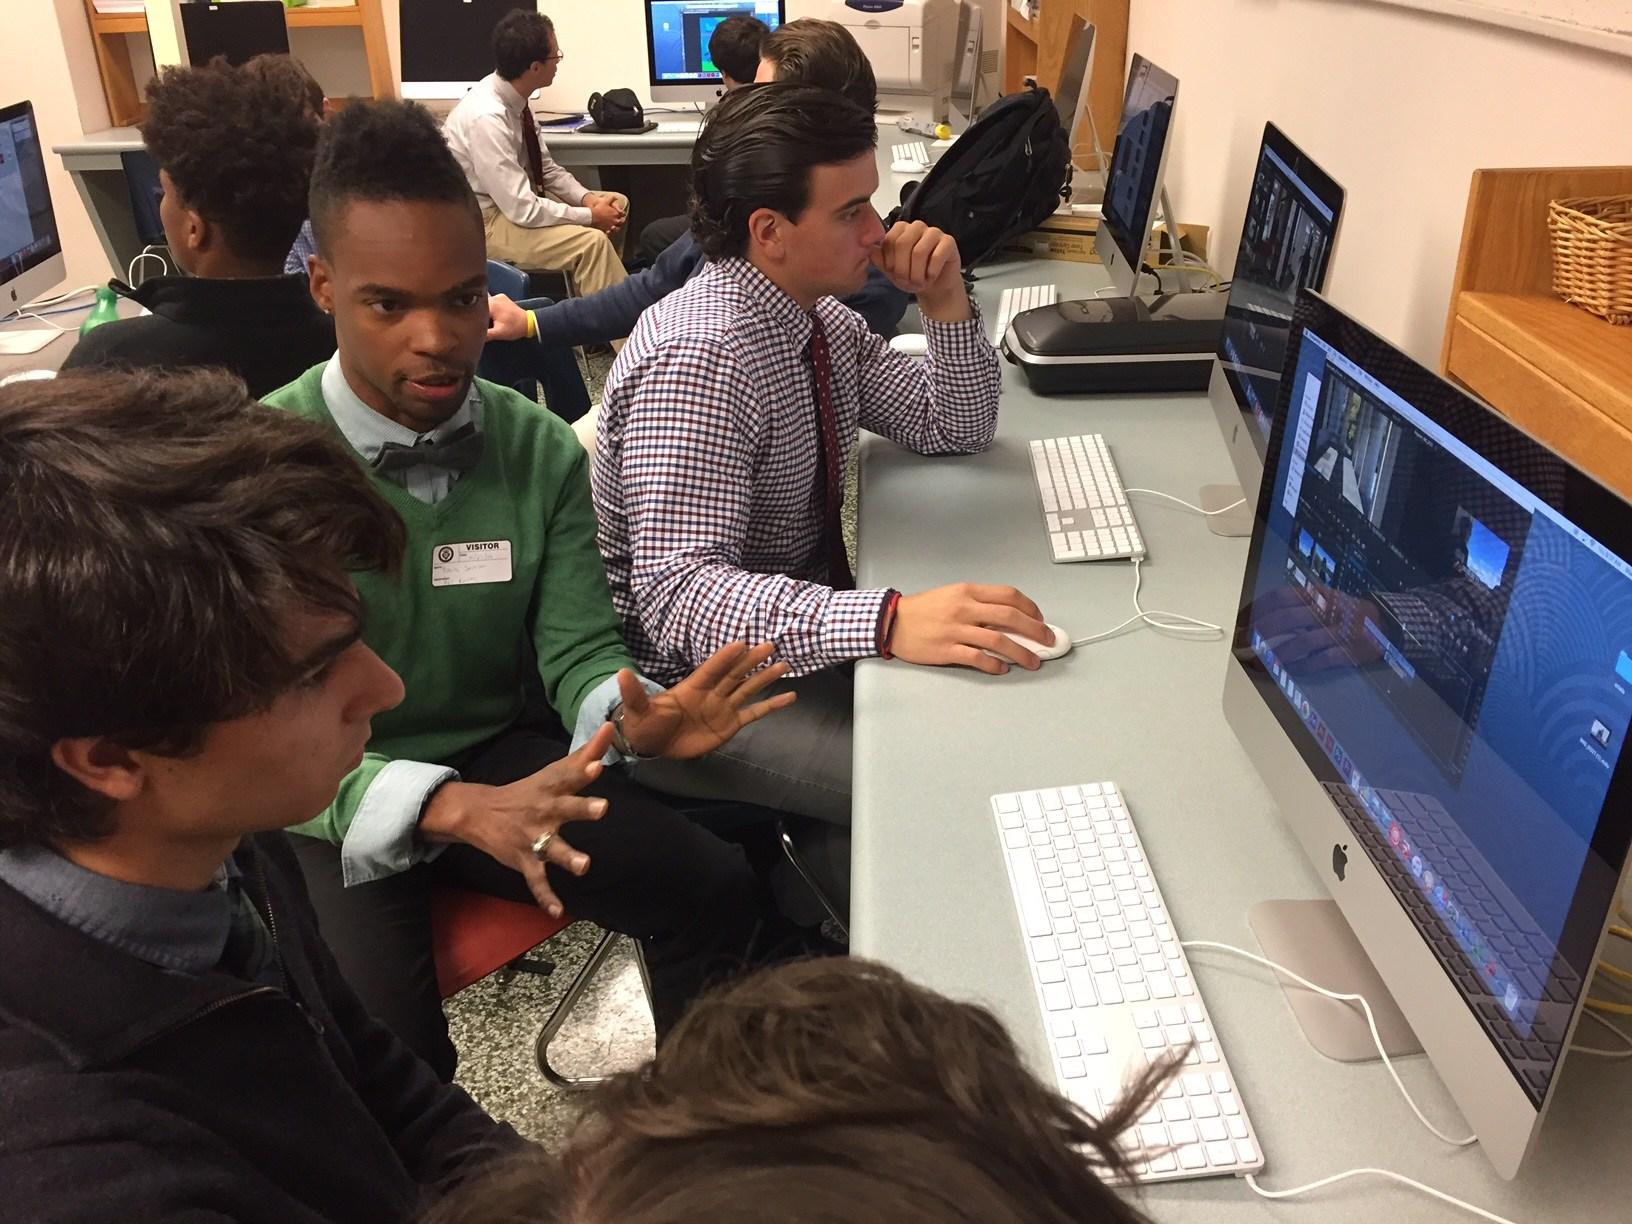 David Jackson '05 works with students